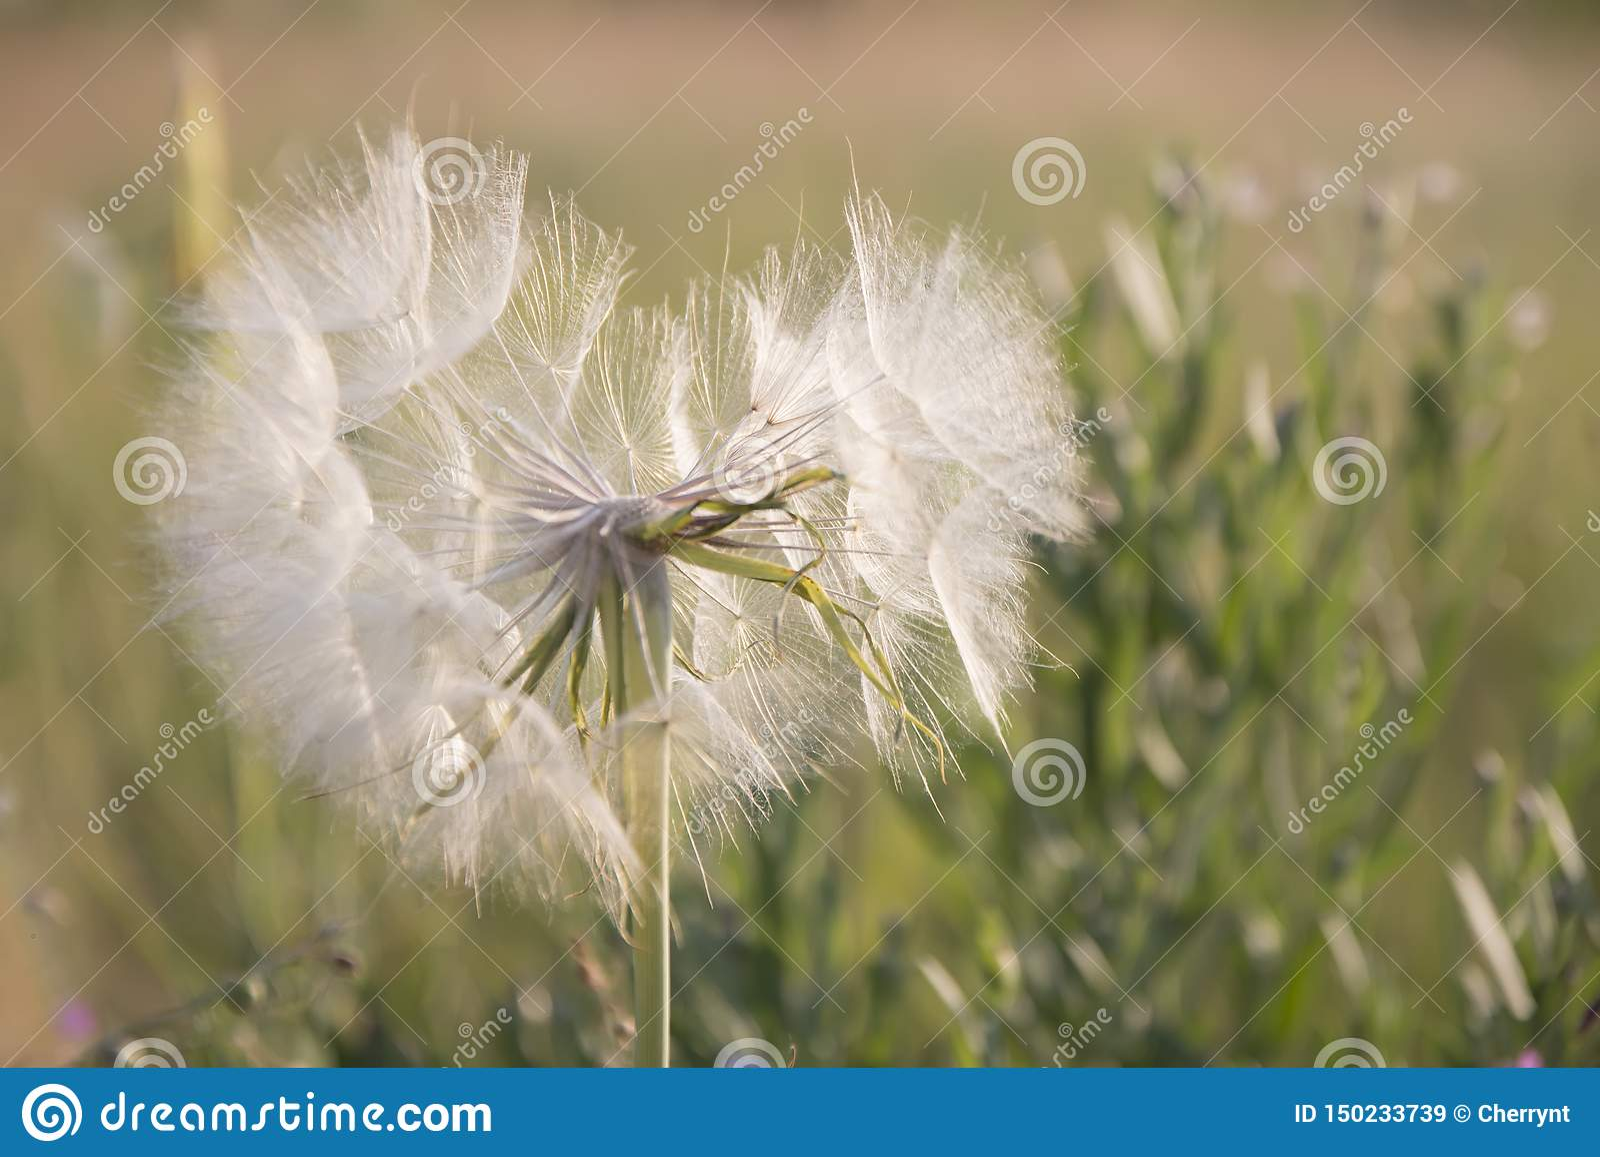 Flying dandelion, in the form of a heart in a meadow